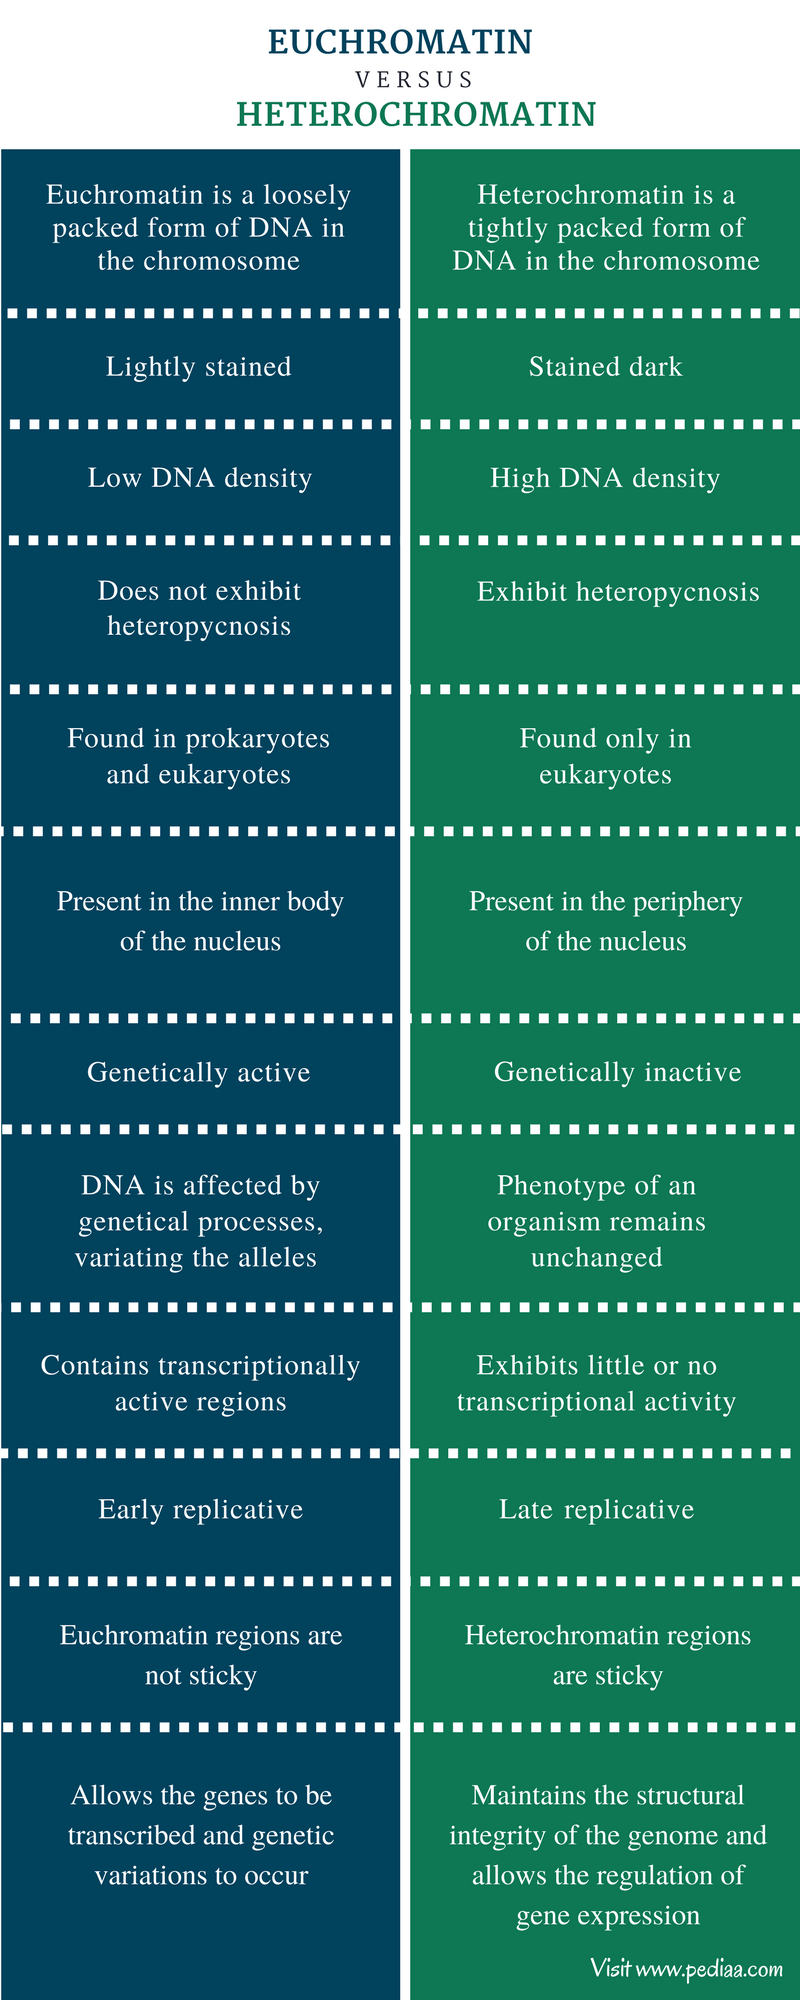 Difference Between Euchromatin and Heterochromatin - Comparison Summary